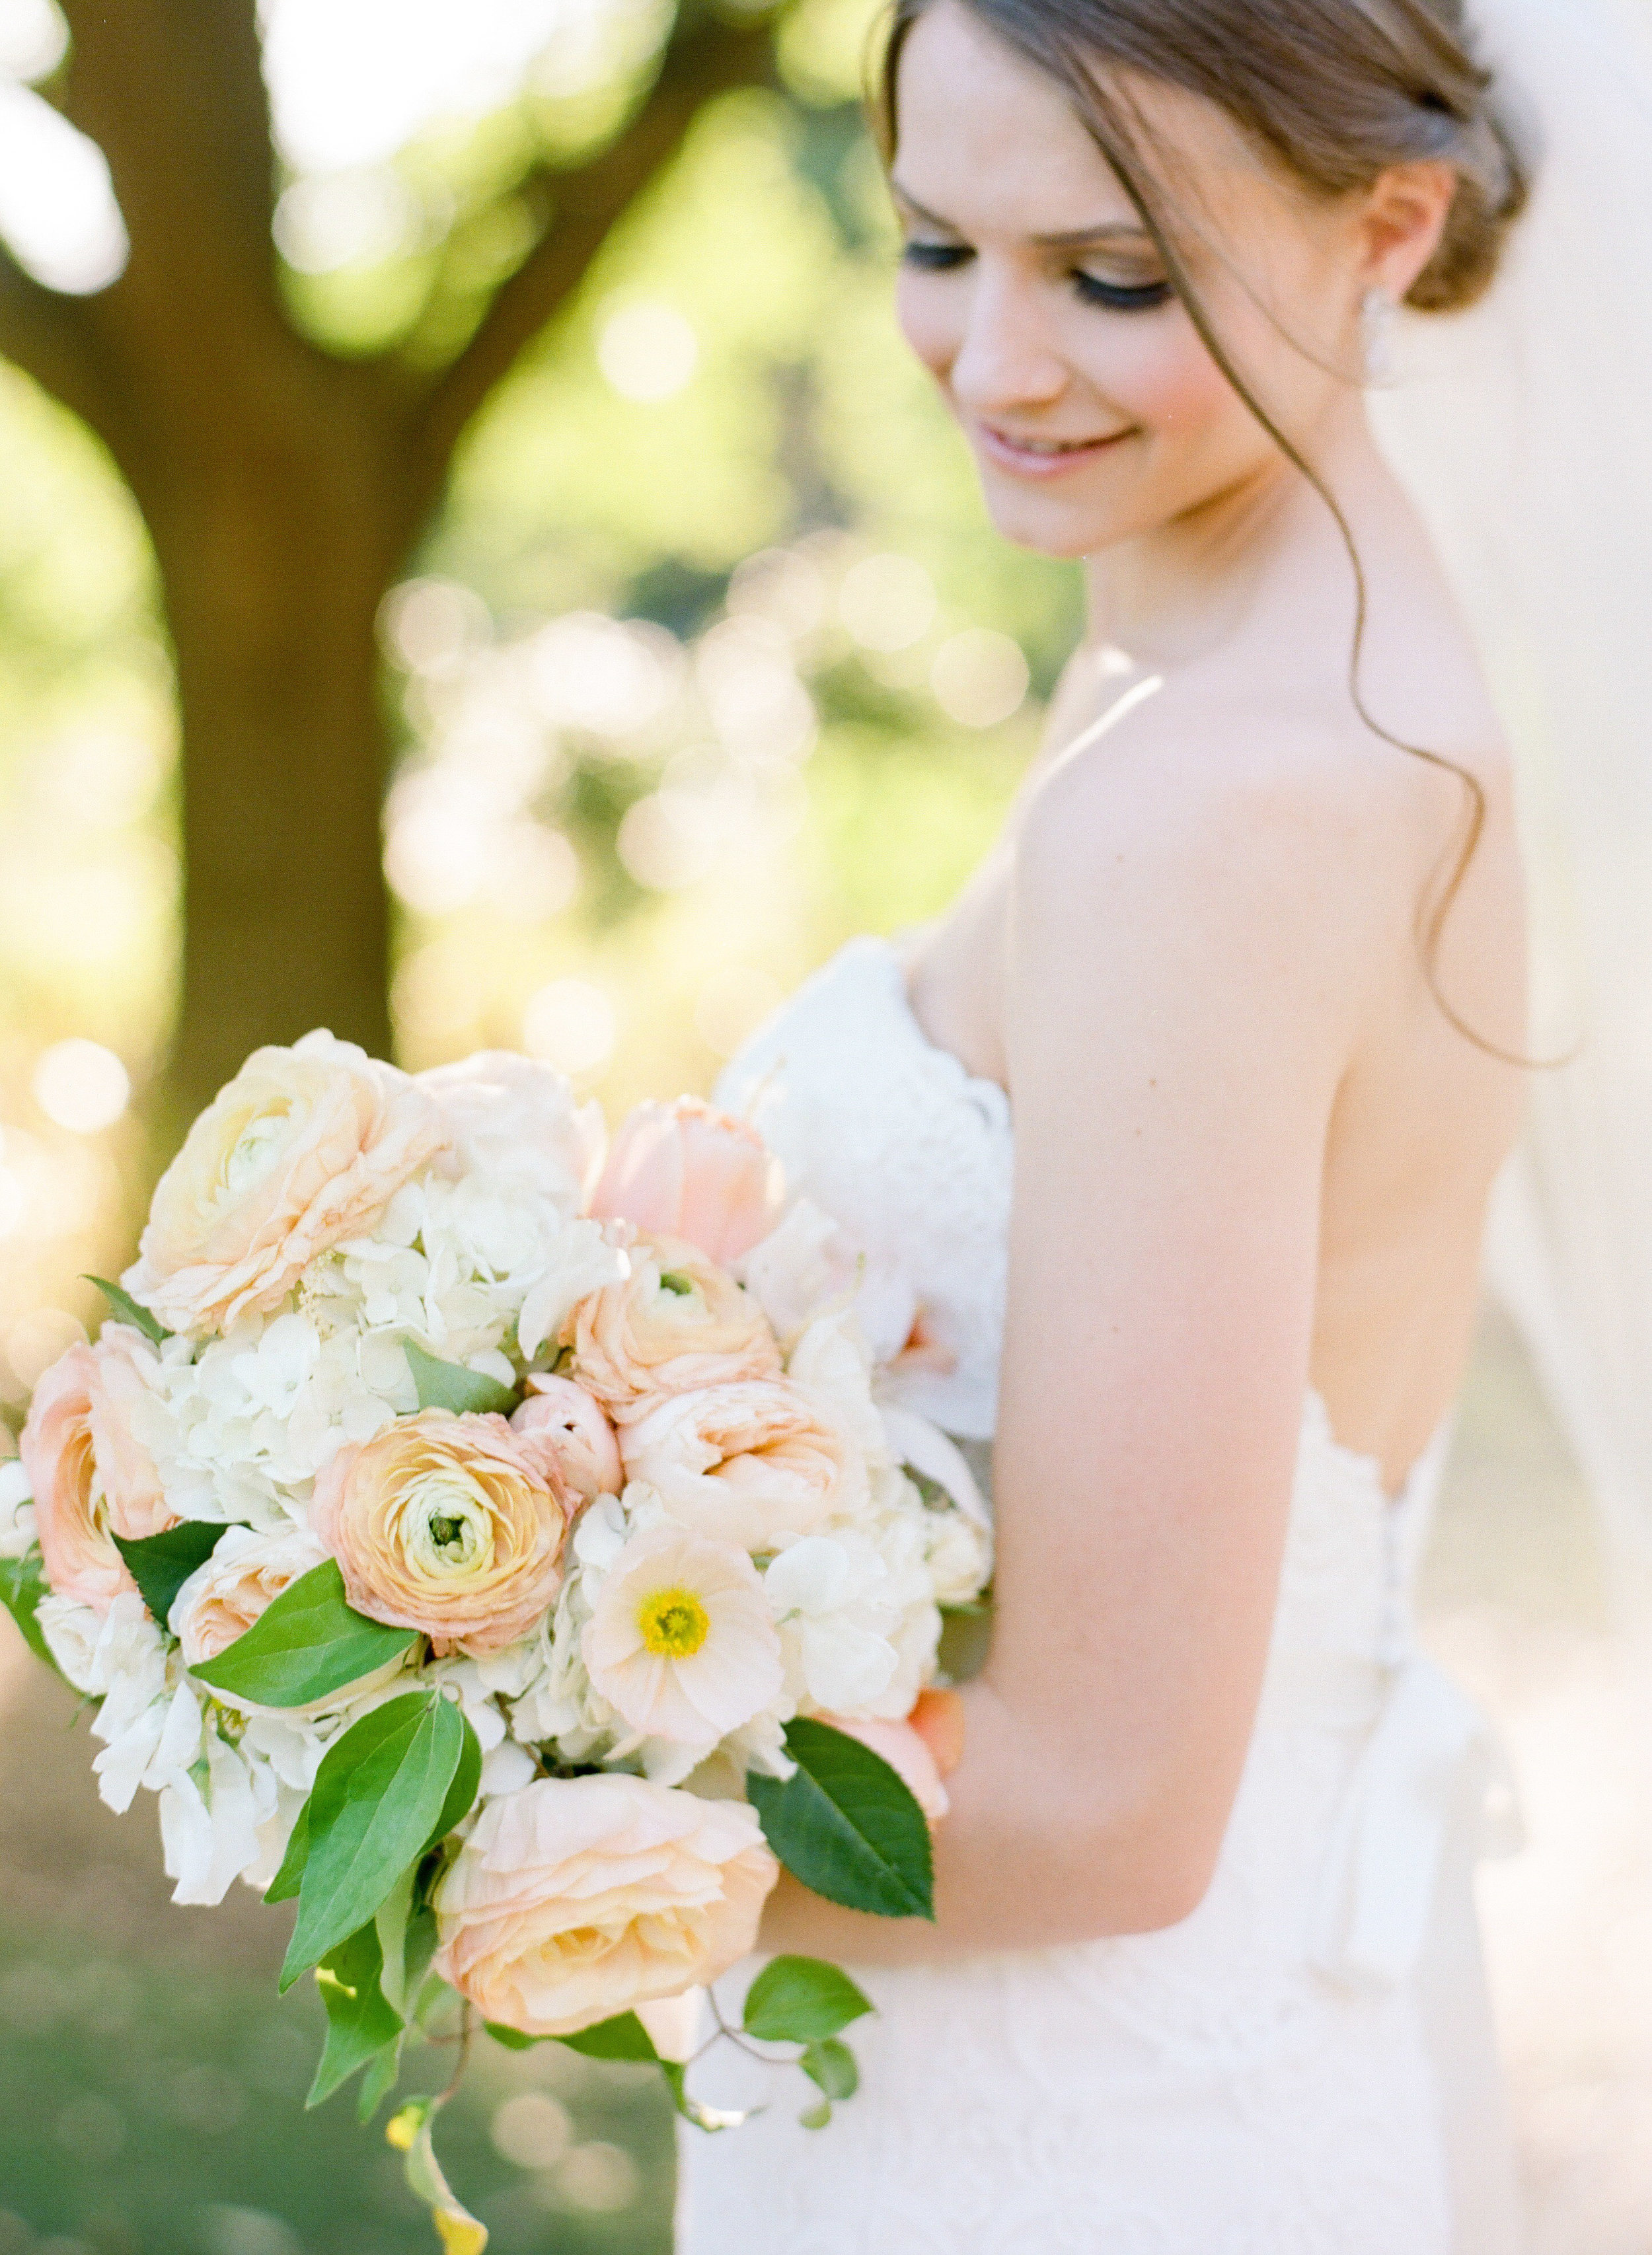 Houston-Wedding-Photographer-Film-Fine-Art-Bridals-Dana Fernandez-Photography-8.jpg